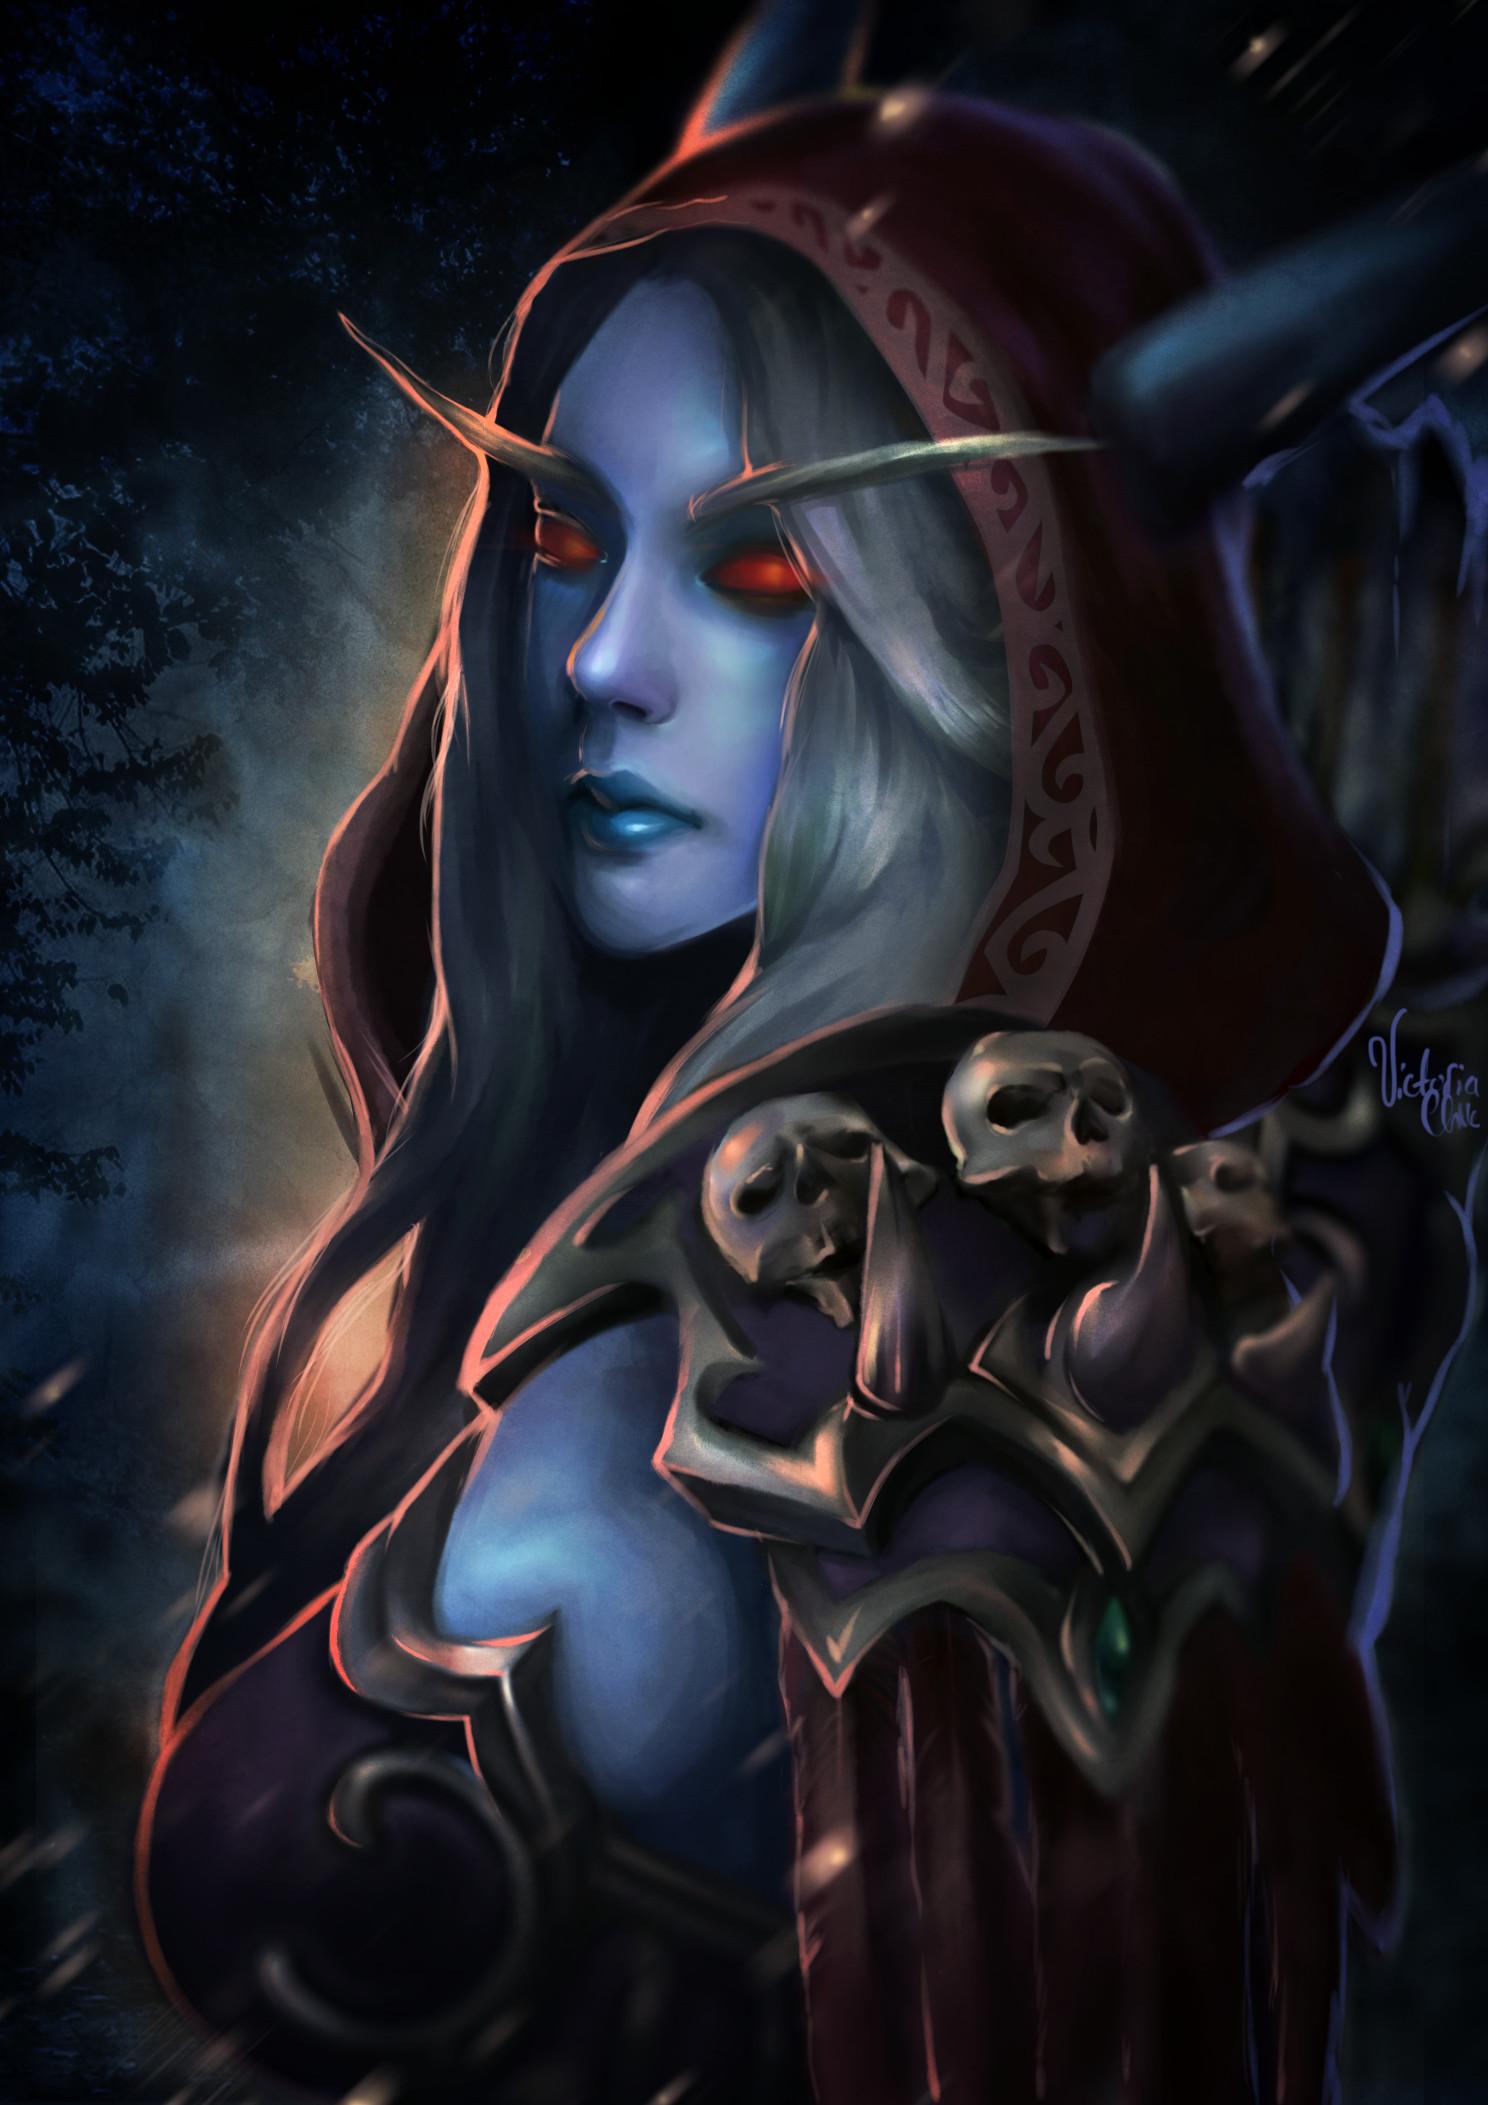 Res: 1488x2105, Pin by Art Seredyuk on SYLVANAS | Pinterest | deviantART, Warcraft art and  Fantasy art